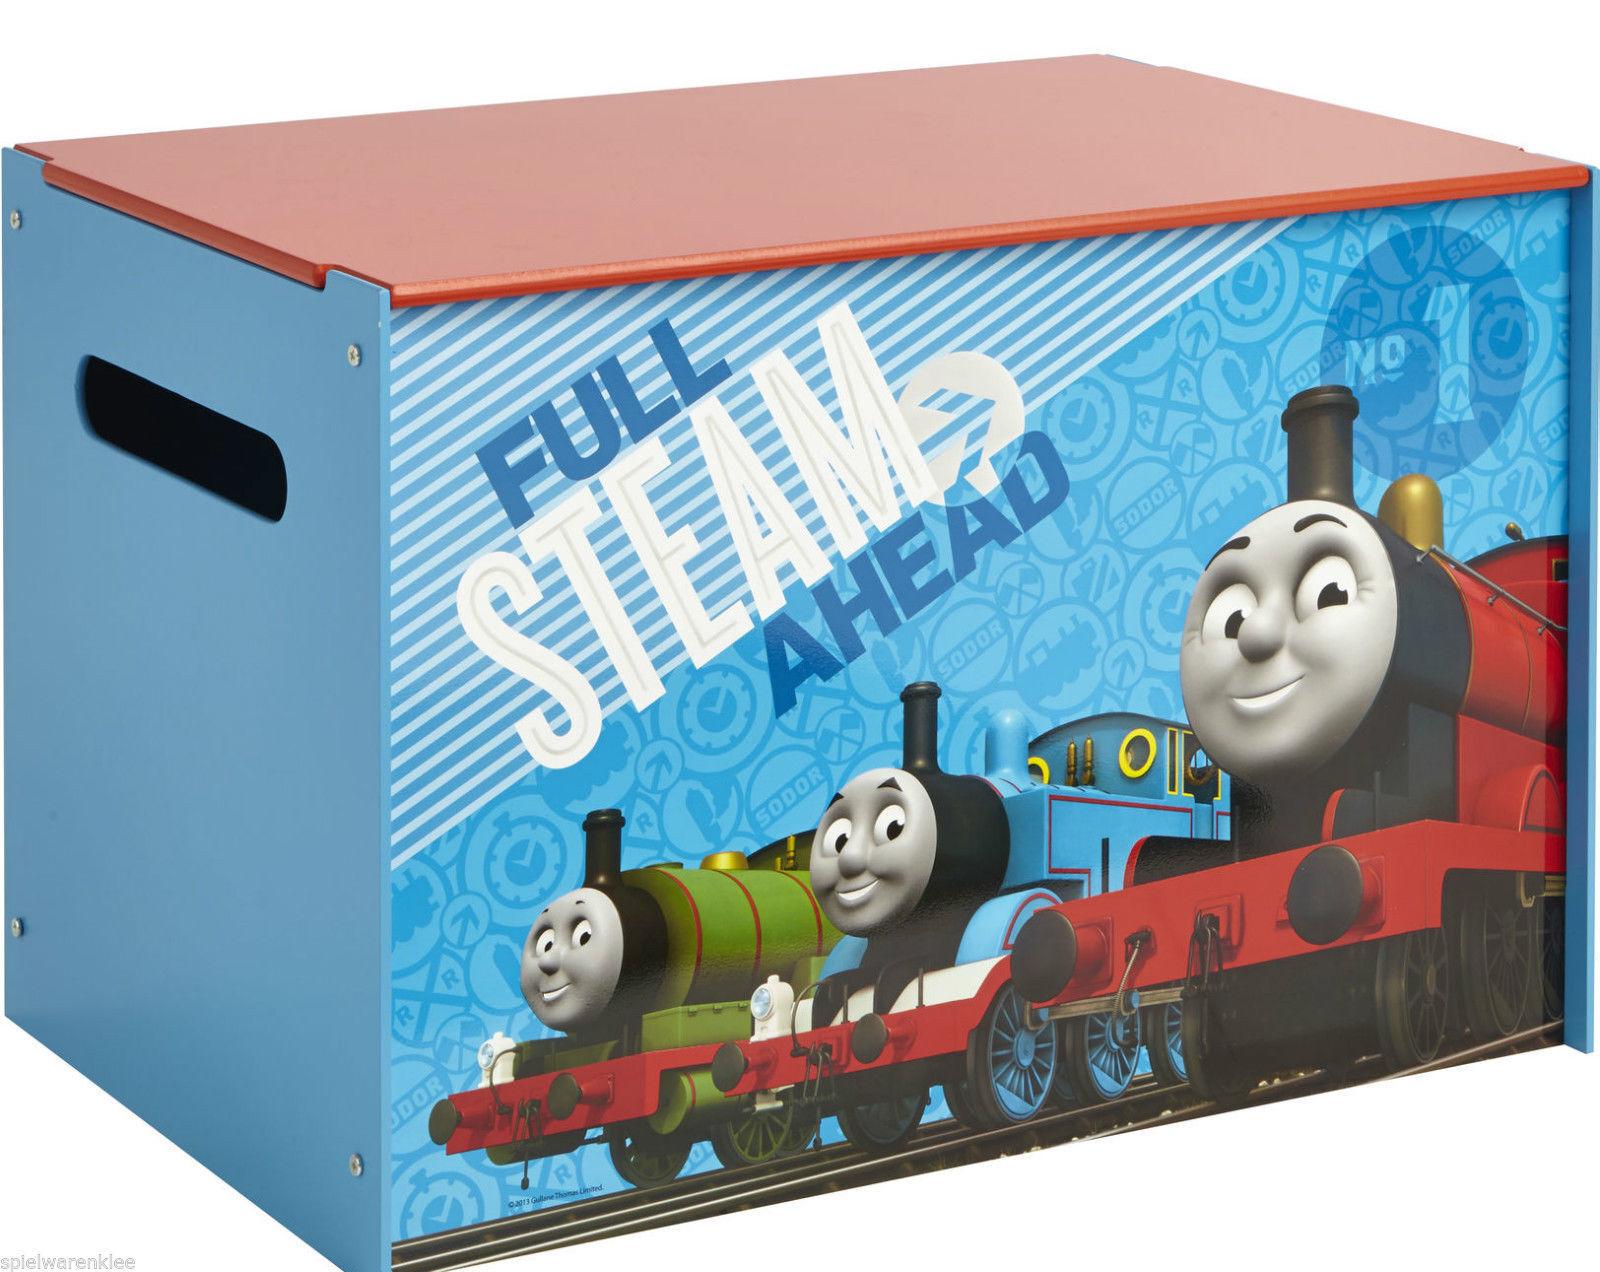 Thomas locomotora juguetes 474tma caja almacenamiento arcón caja miró 474tma juguetes 760e19